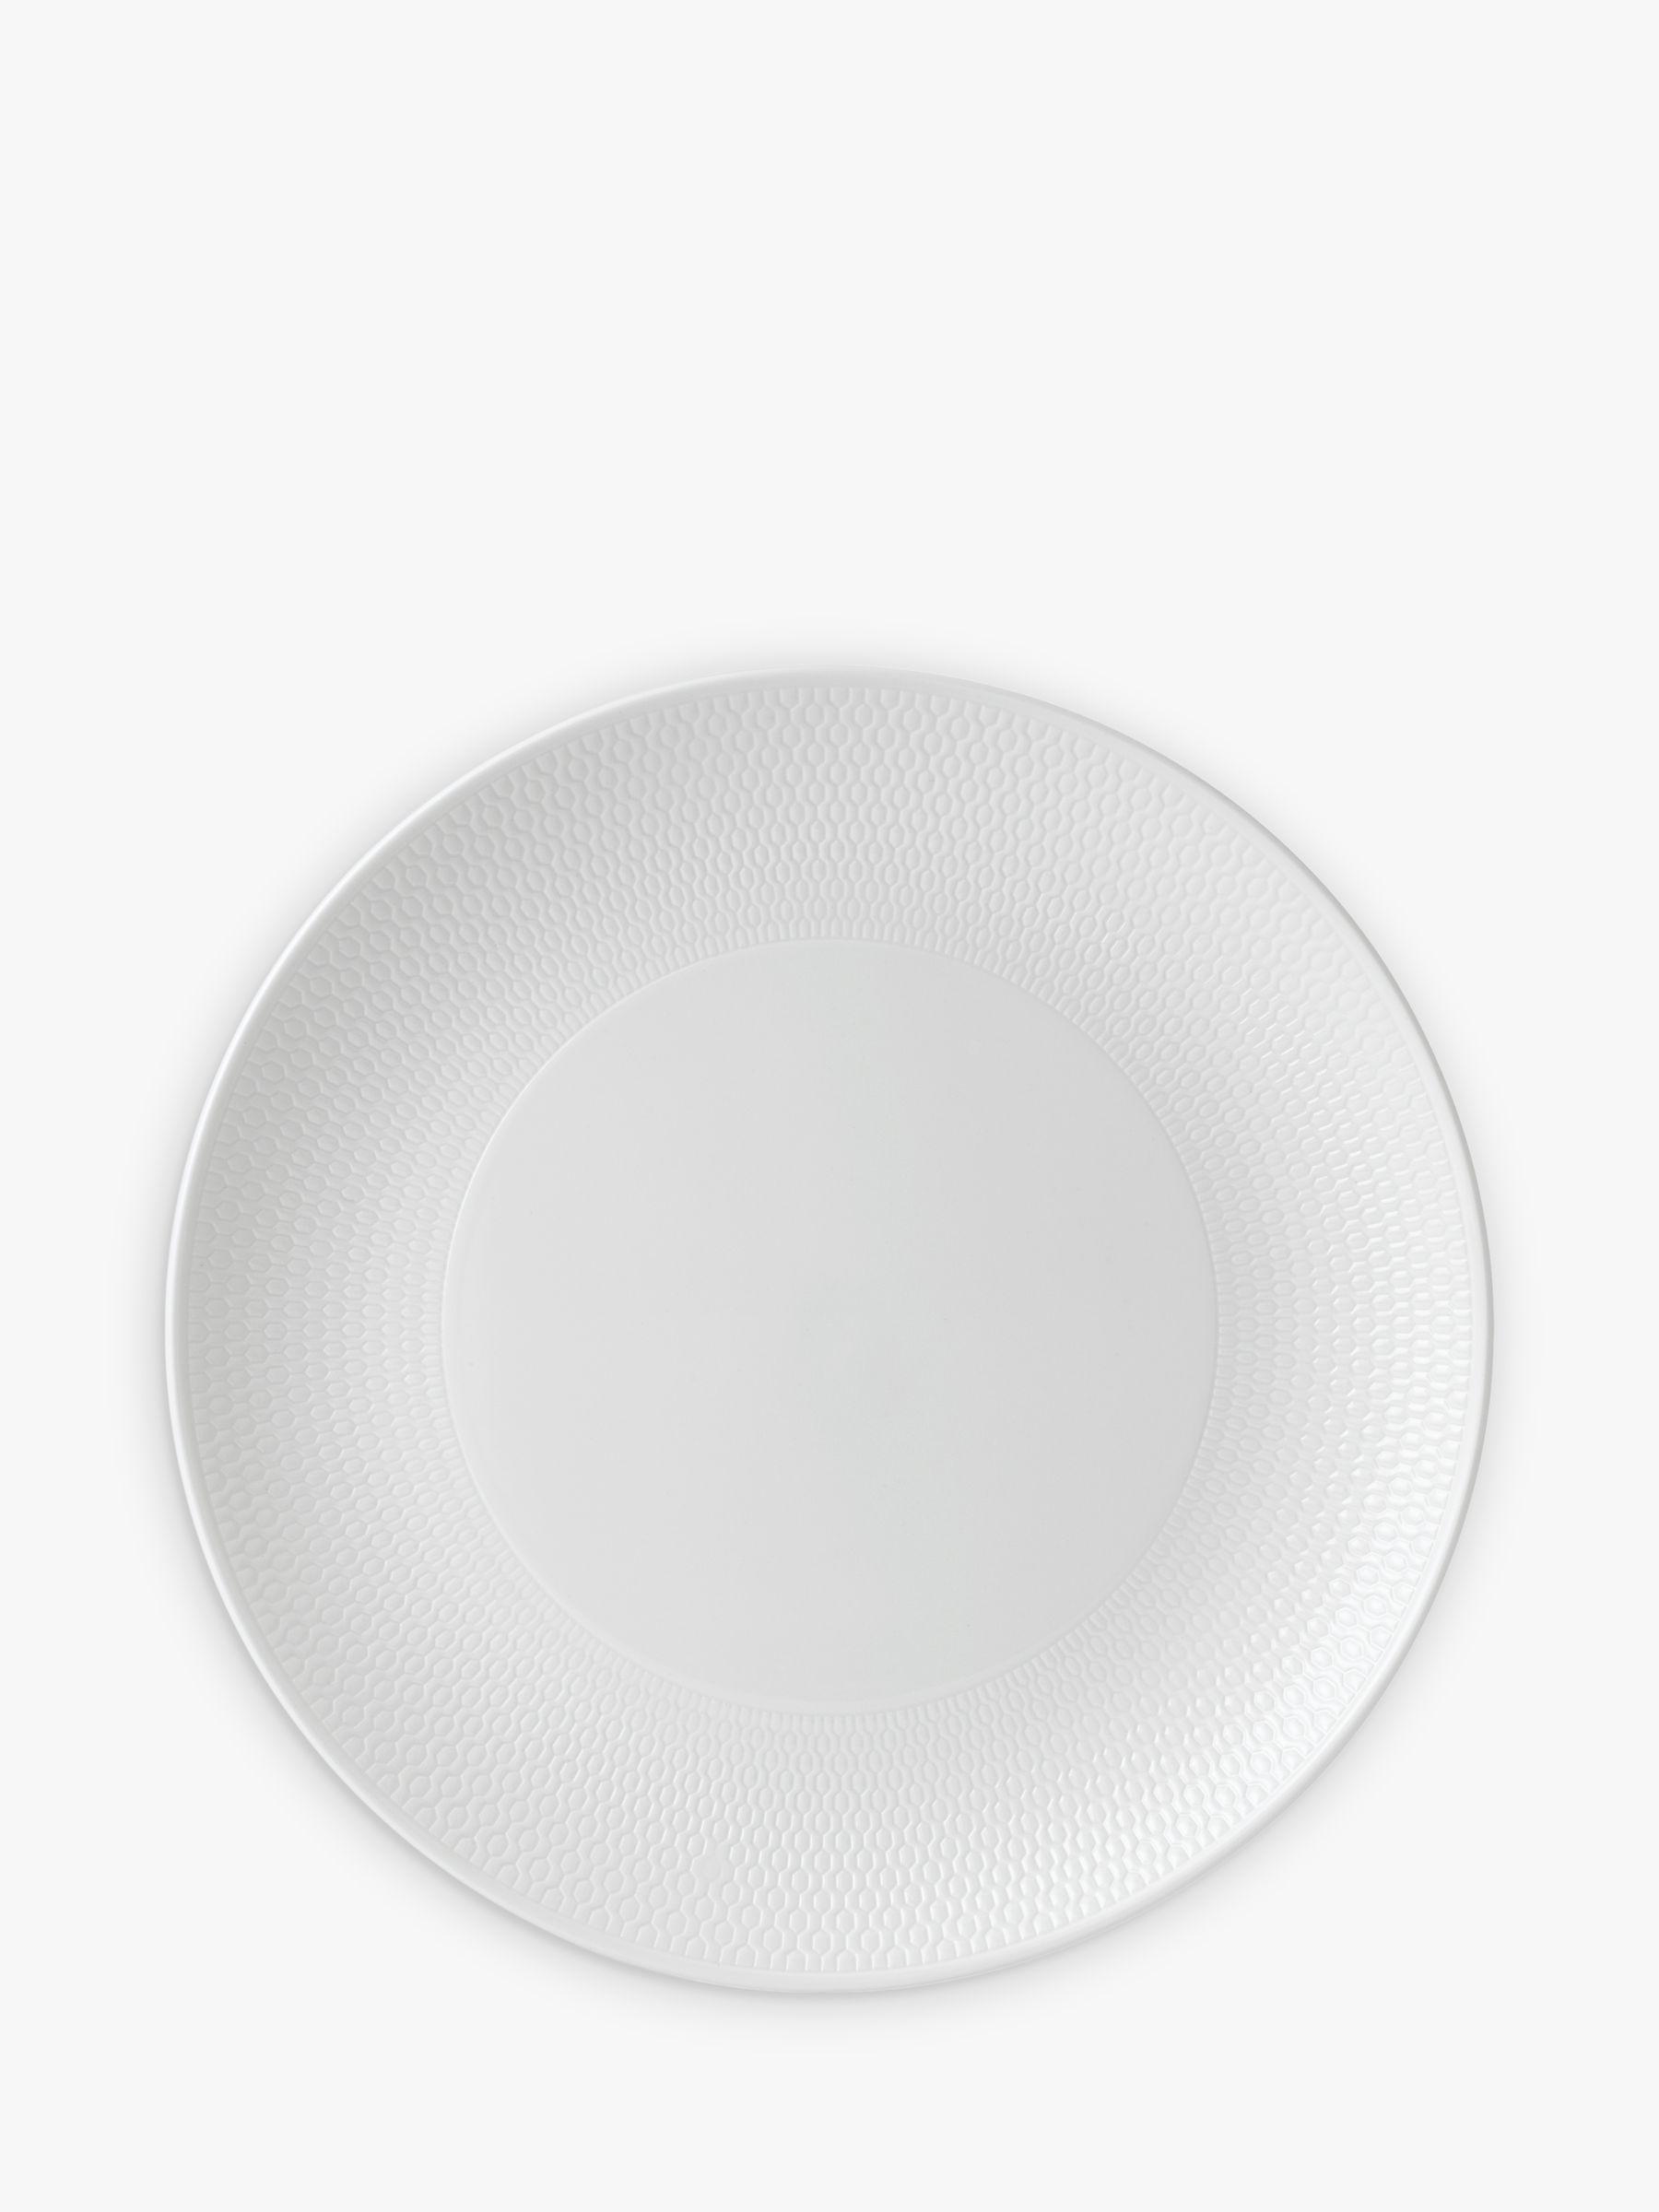 Wedgwood Wedgwood Gio Dinner Plate, White, Dia.28cm